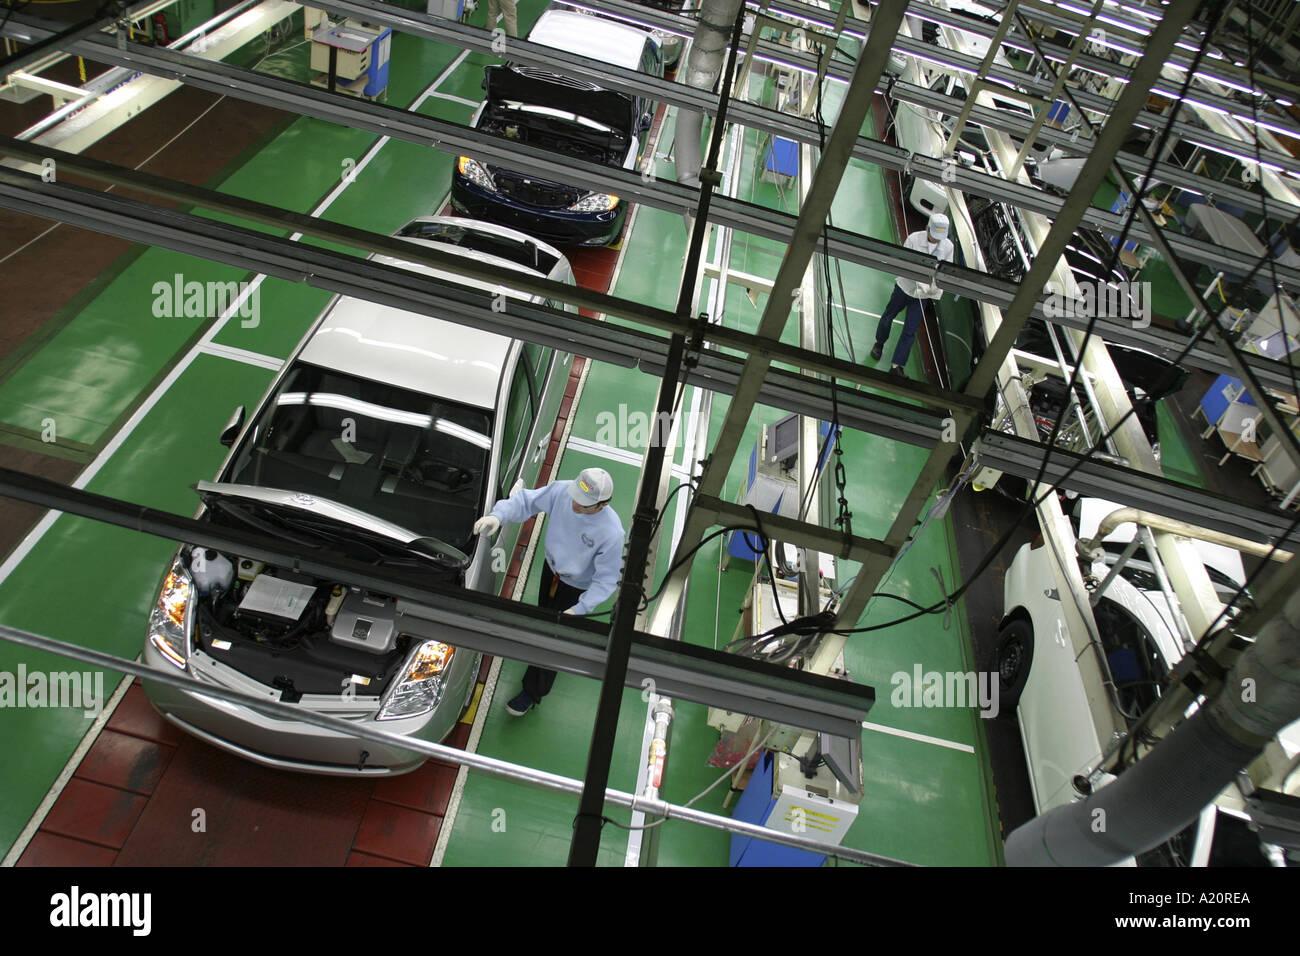 Toyota car production line, Tsutsumi factory, Toyota City, Nagoya, Japan - Stock Image